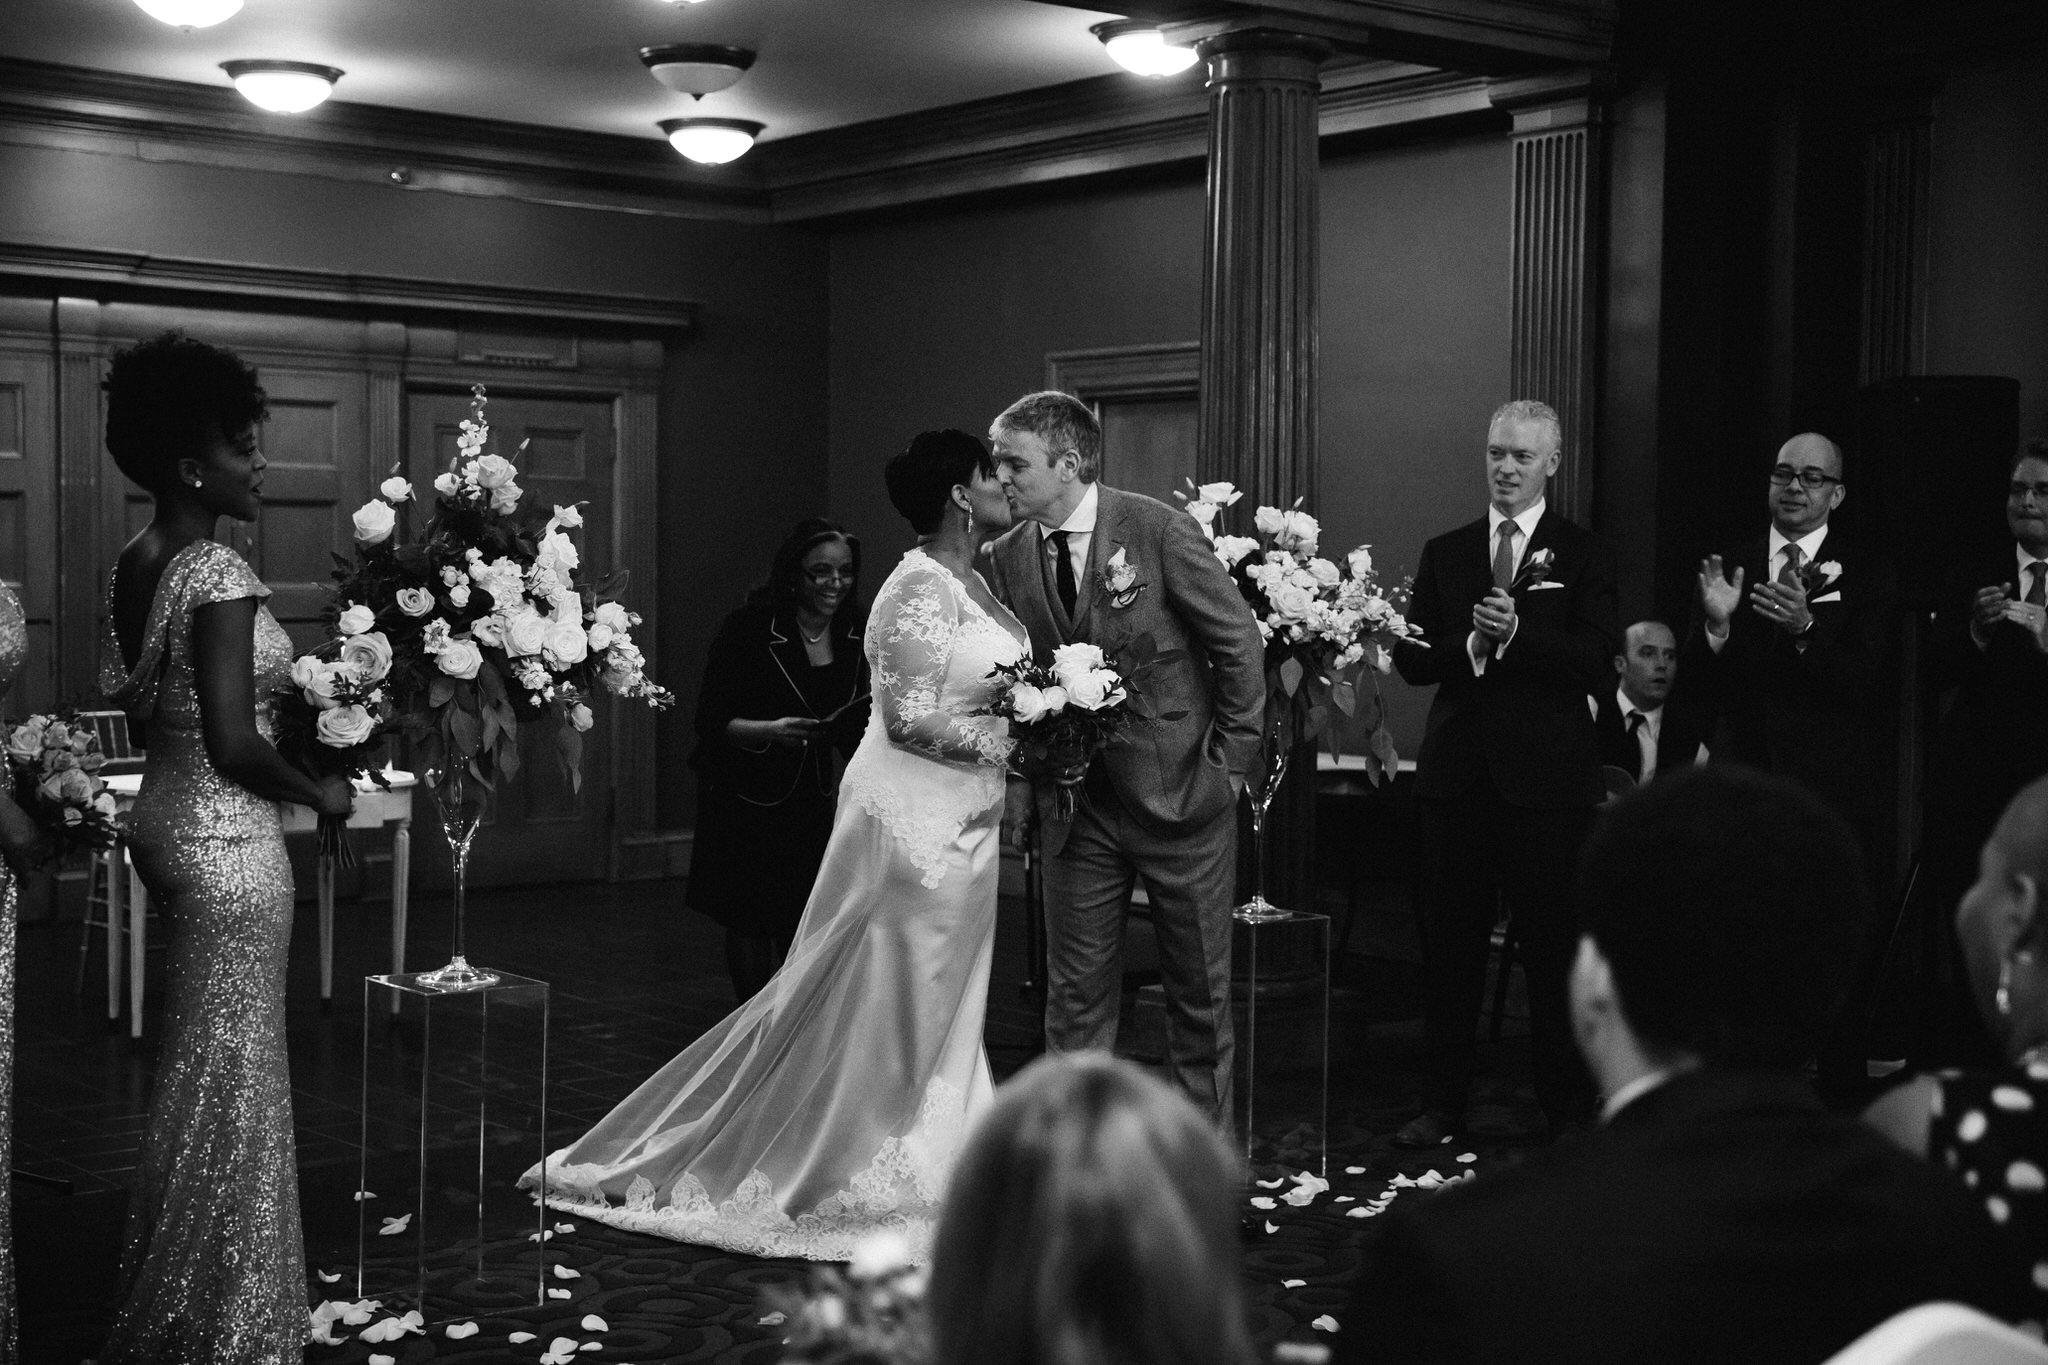 wedding photos one king west wedding cere